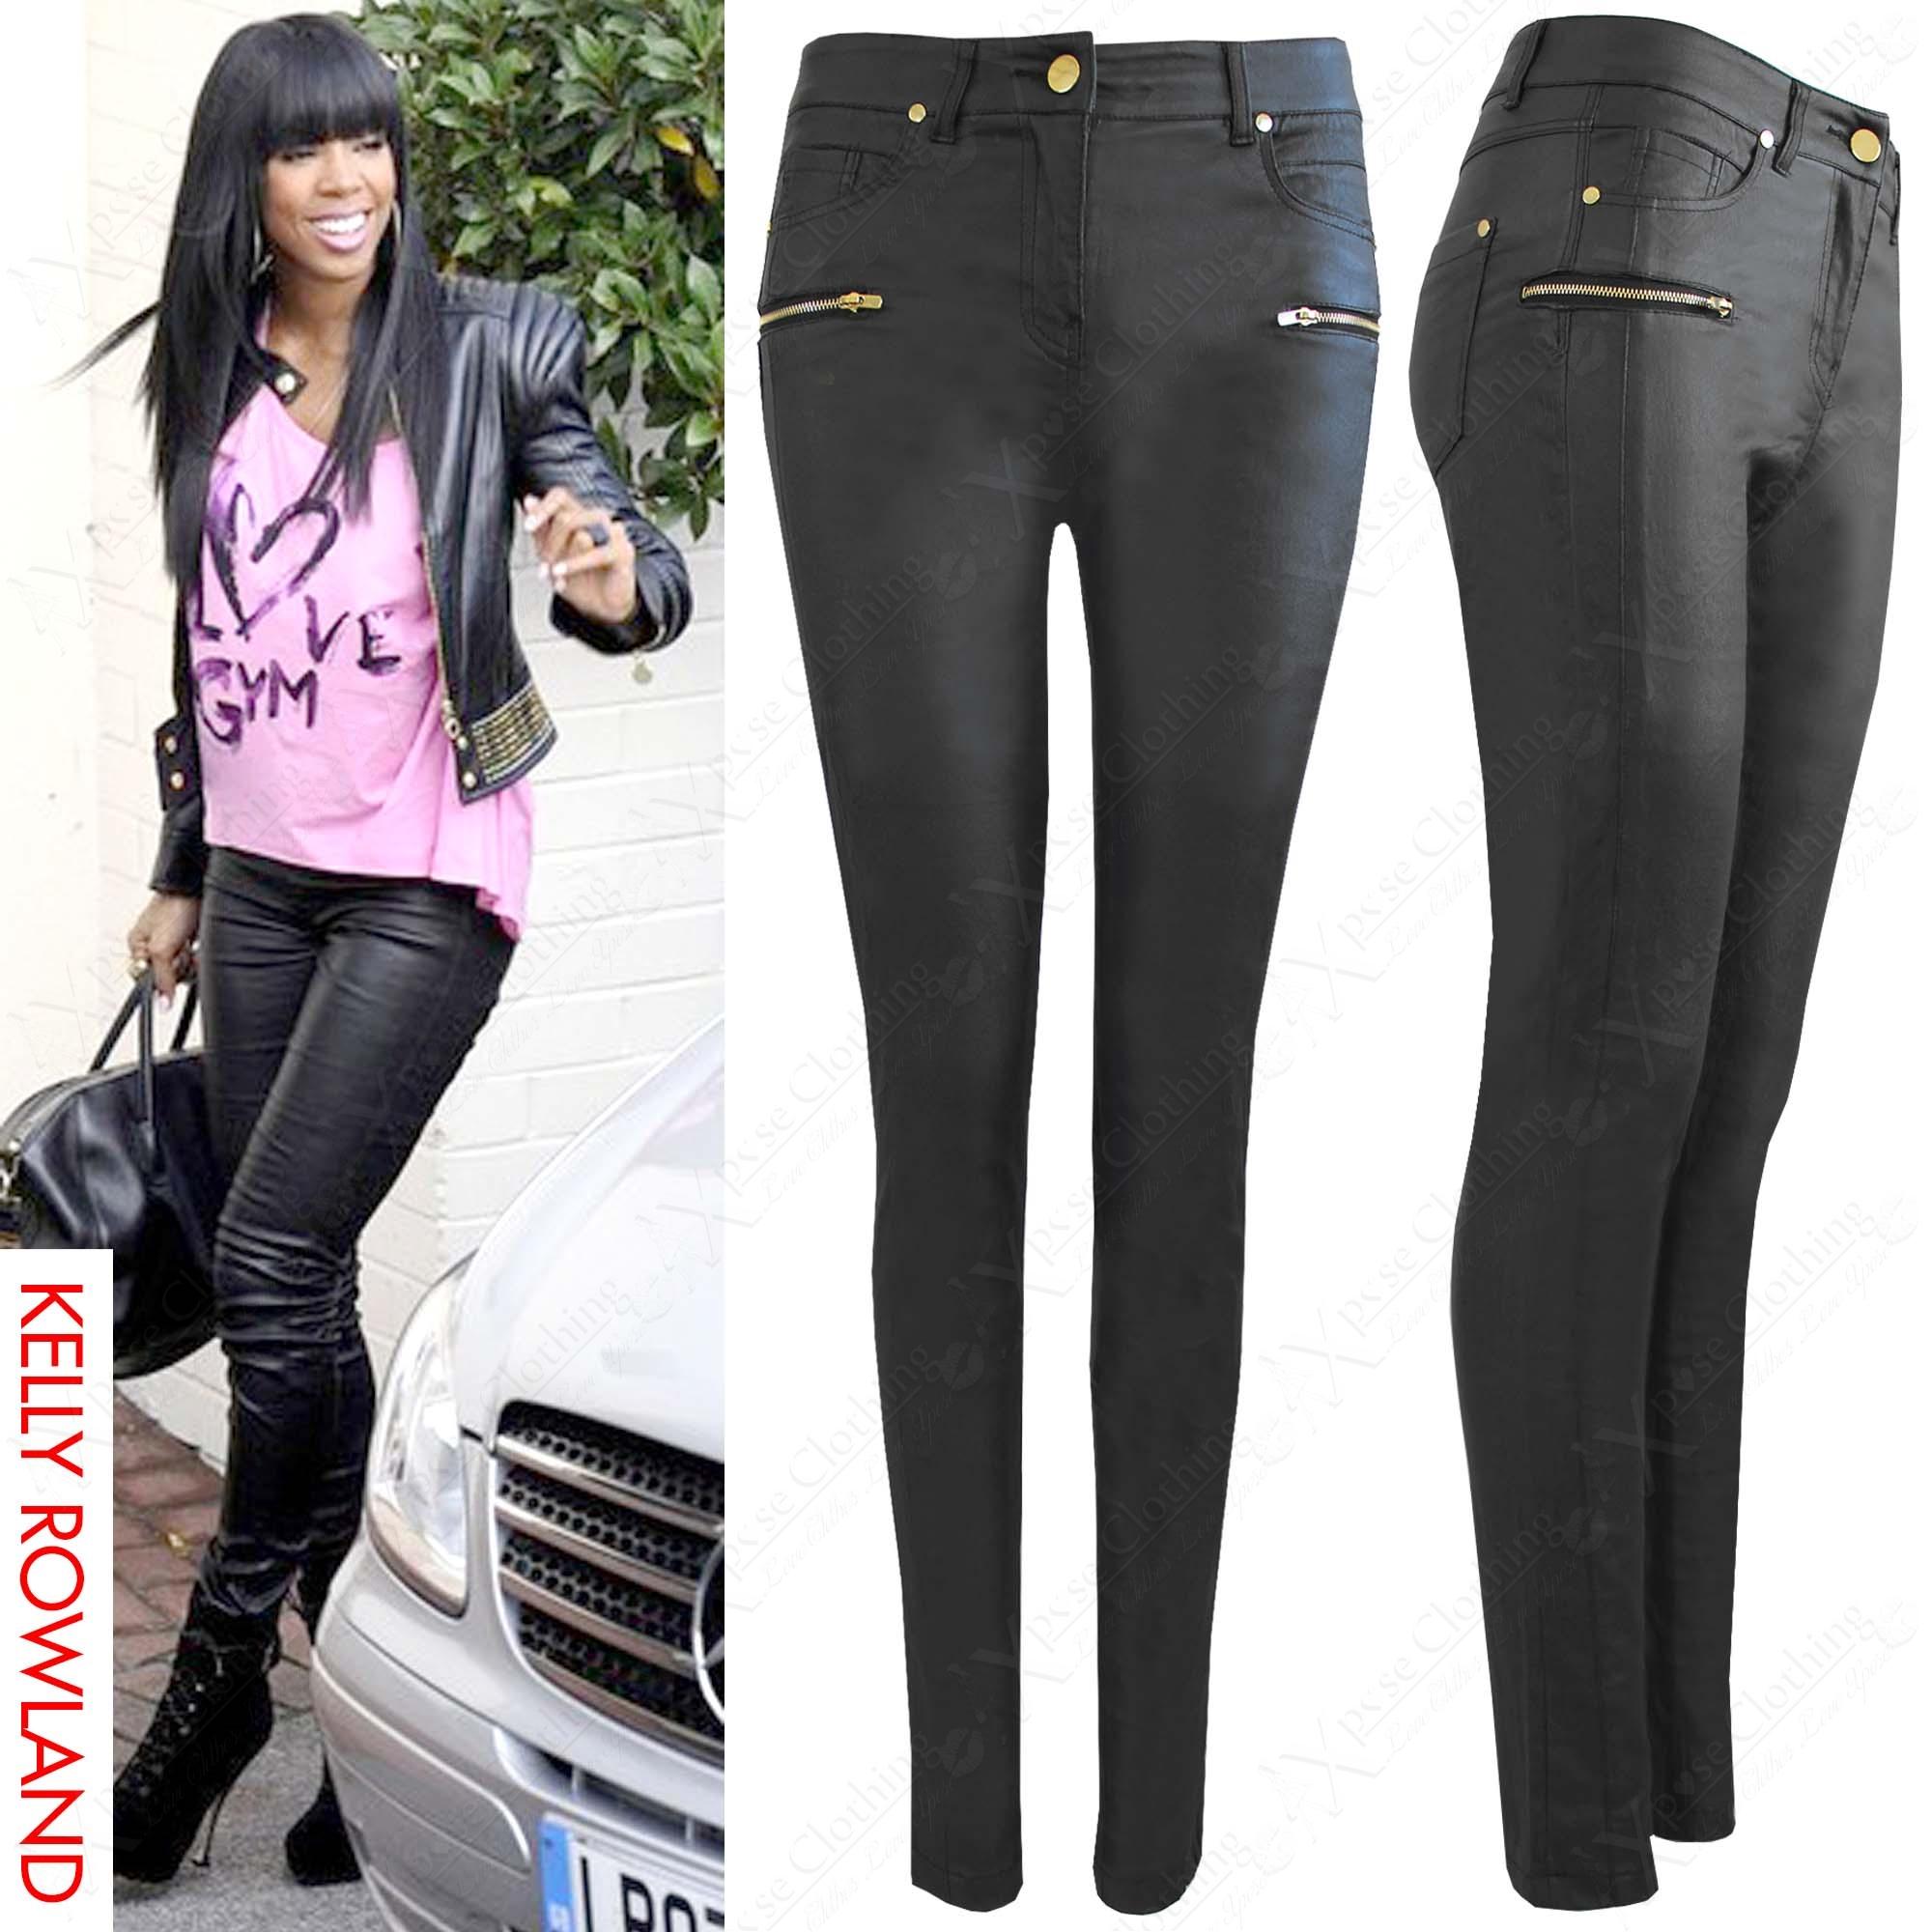 details about neu damen schwarze pu rei verschluss jeans leder lack. Black Bedroom Furniture Sets. Home Design Ideas